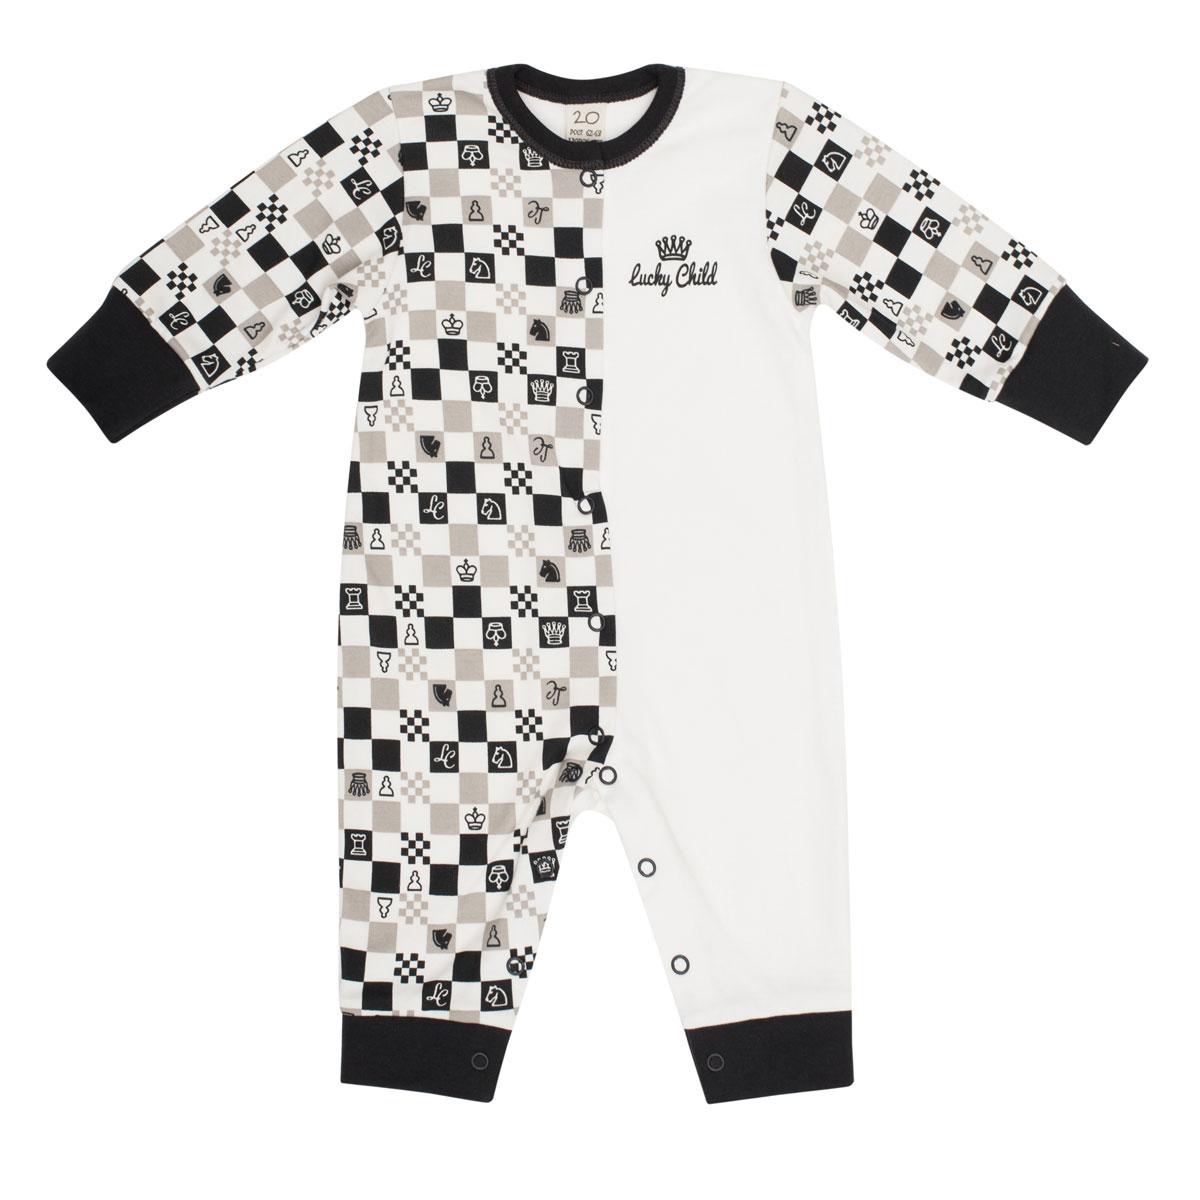 Комбинезон домашний Lucky Child Шахматный турнир кофта для девочки lucky child шахматный турнир цвет молочный темно серый 29 20д размер 68 74